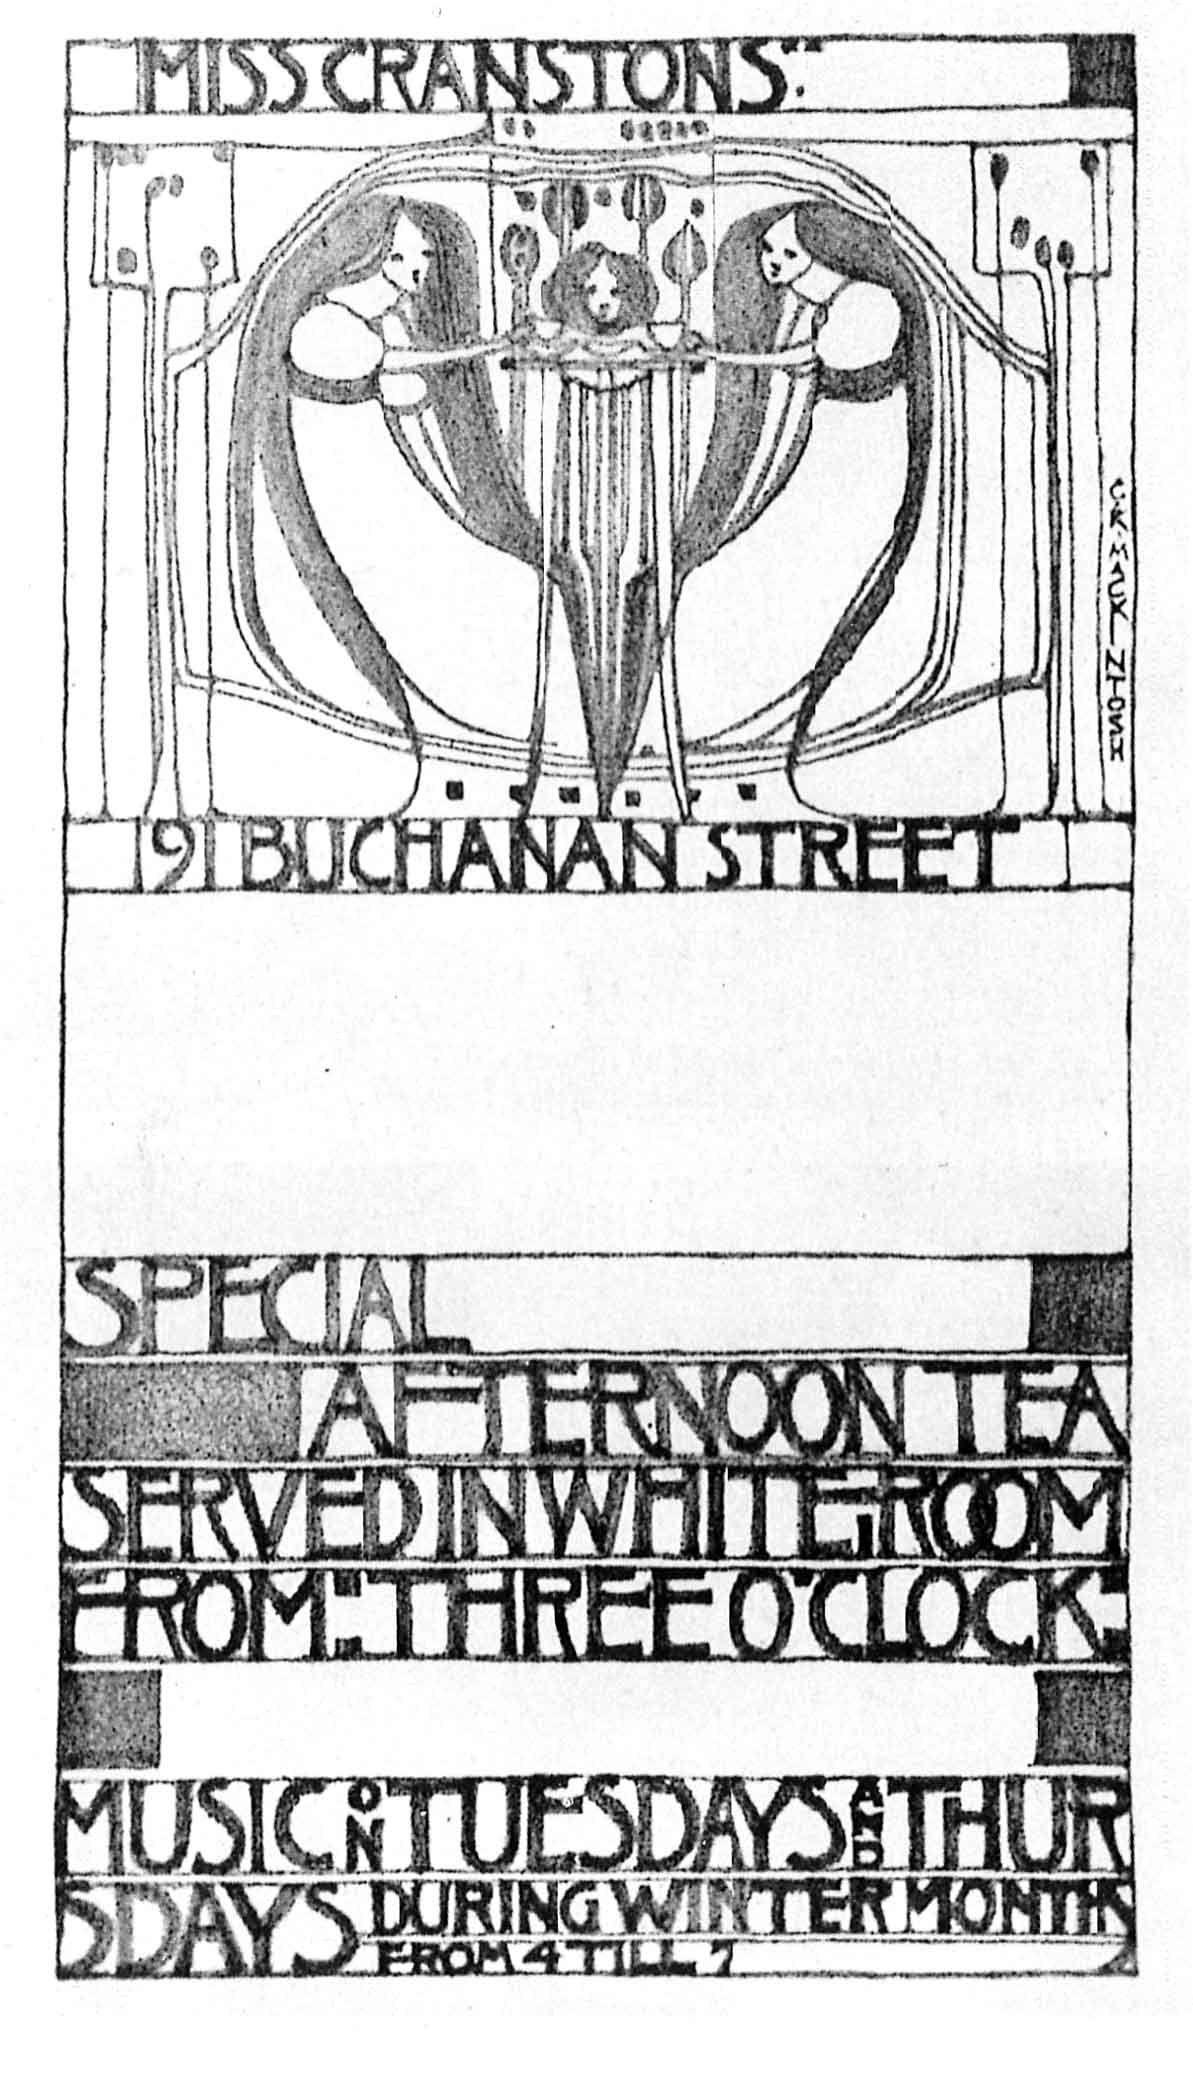 advertisement for Willow Tea Room in Glasgow, Scotland. designed by  Charles Rennie Mackintosh, 1904